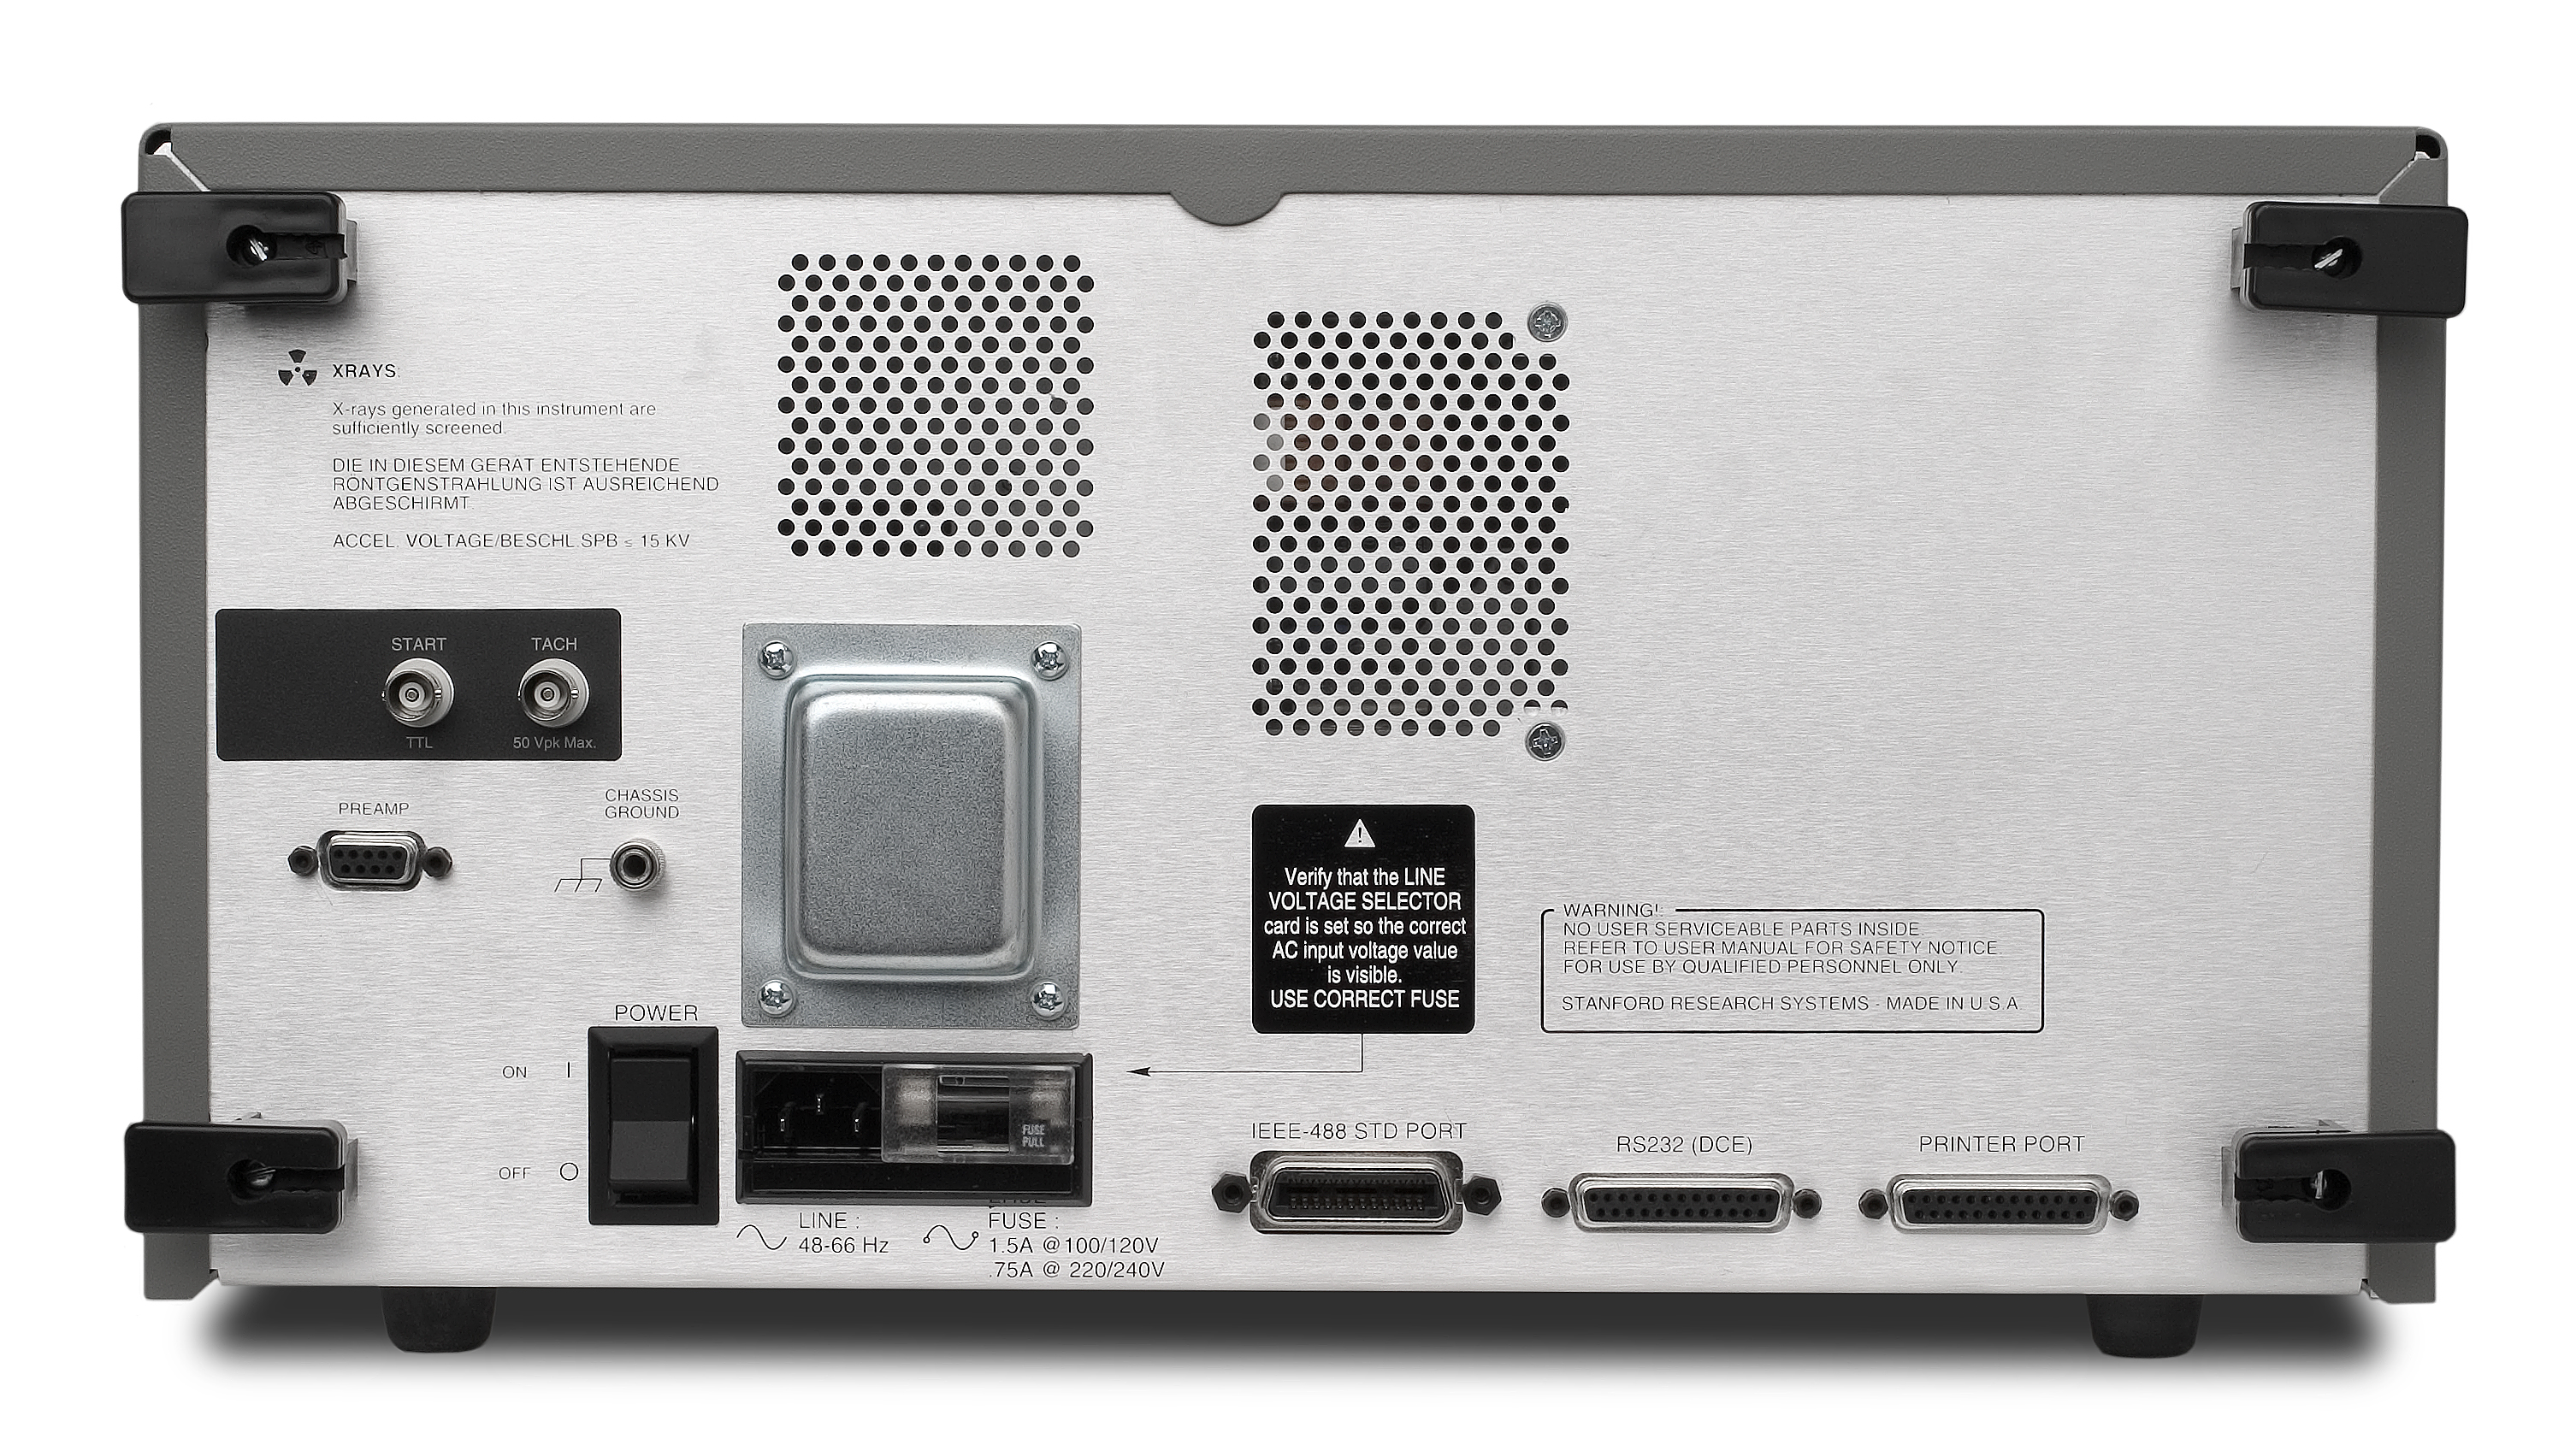 Dynamic Signal Analyzer Sr785 Fast Digital Lockin Amplifier For Spectrum Extraction Rear Panel